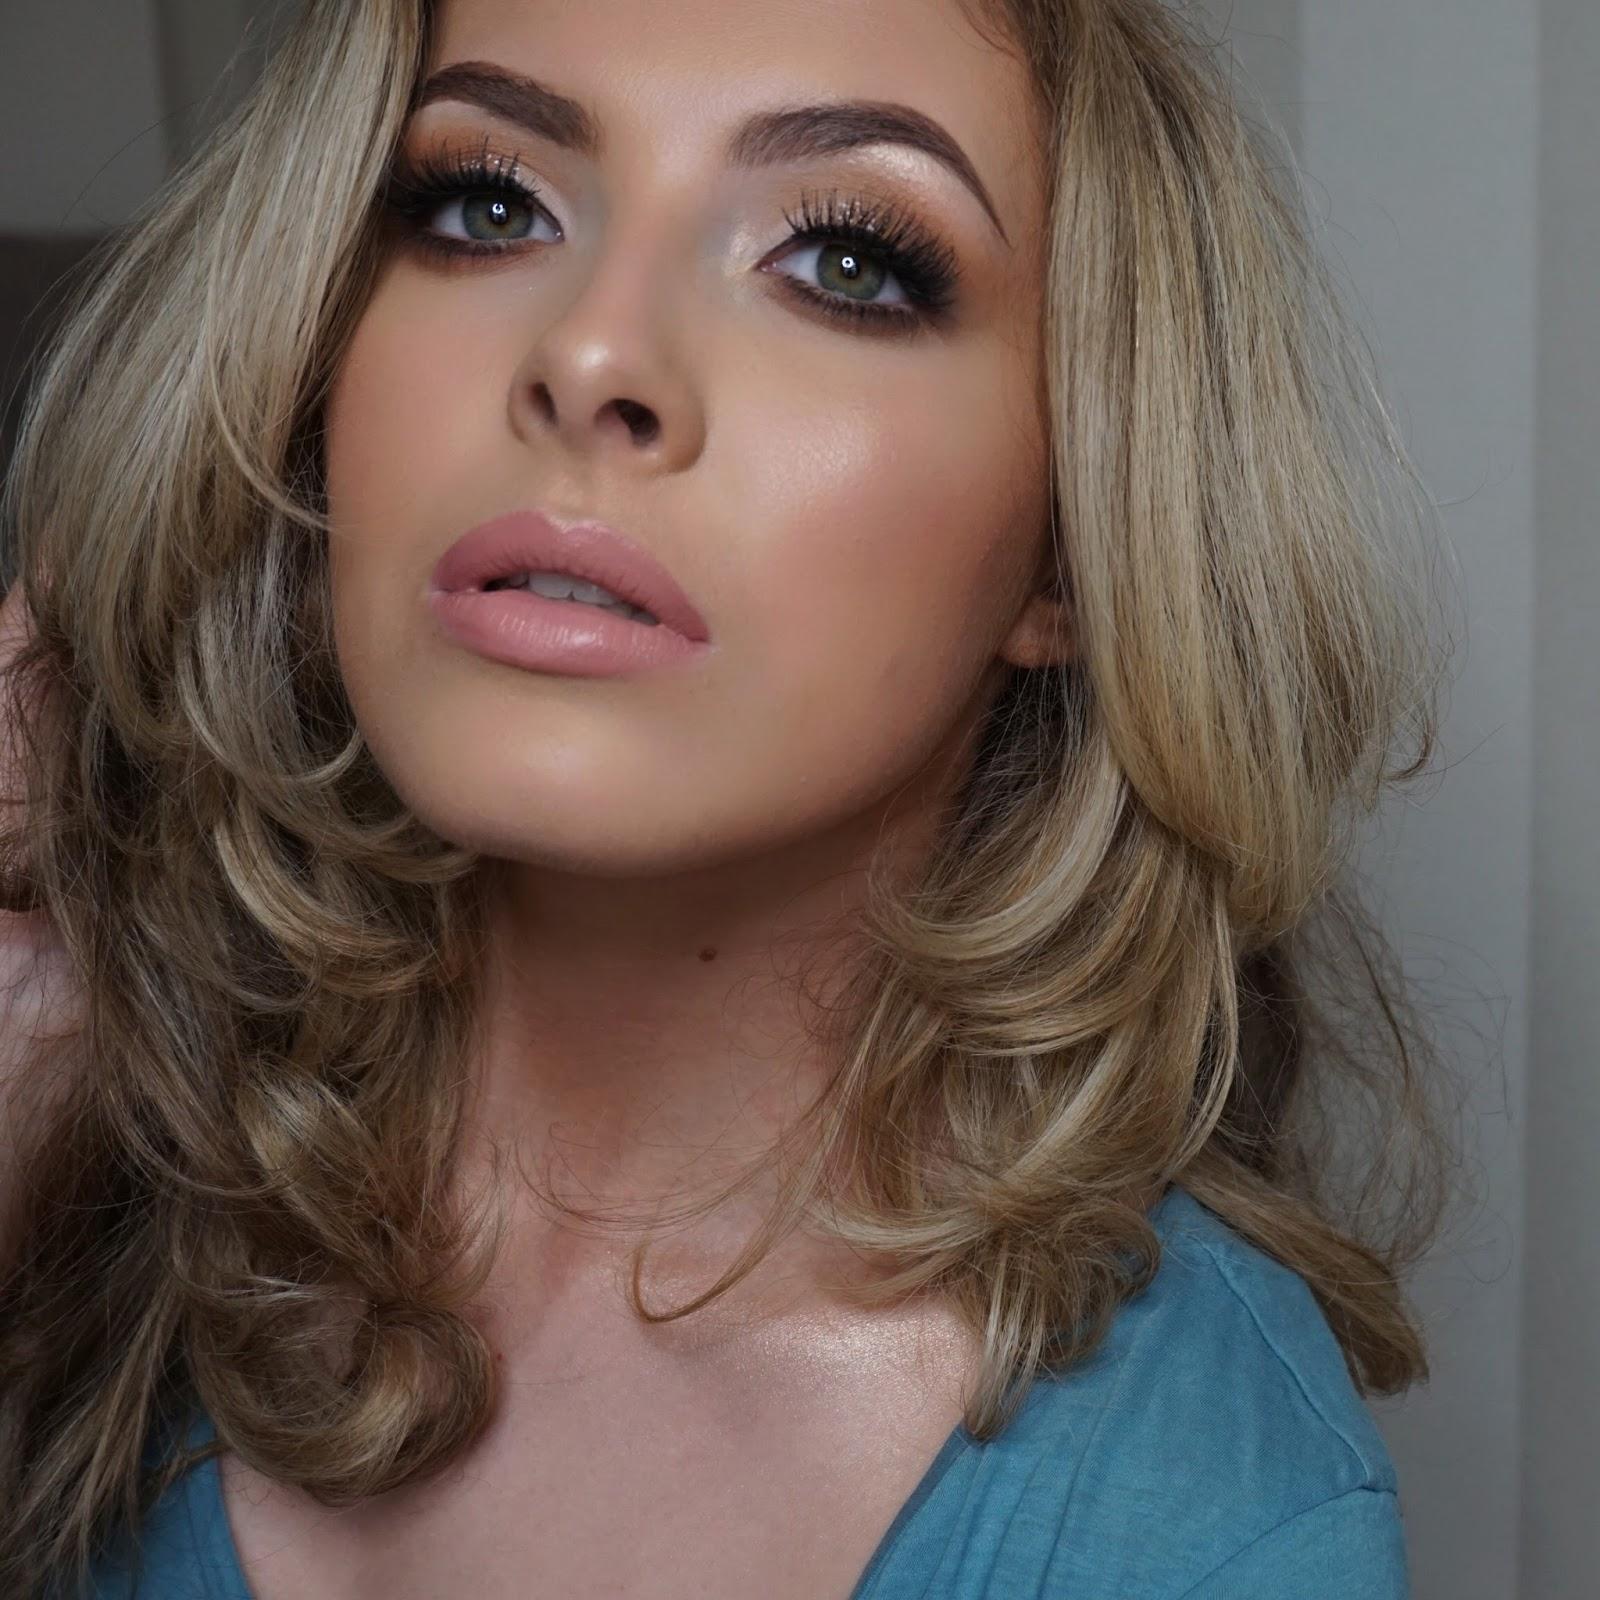 Best Charlotte Tilbury Makeup Products - Kats Fab Finds